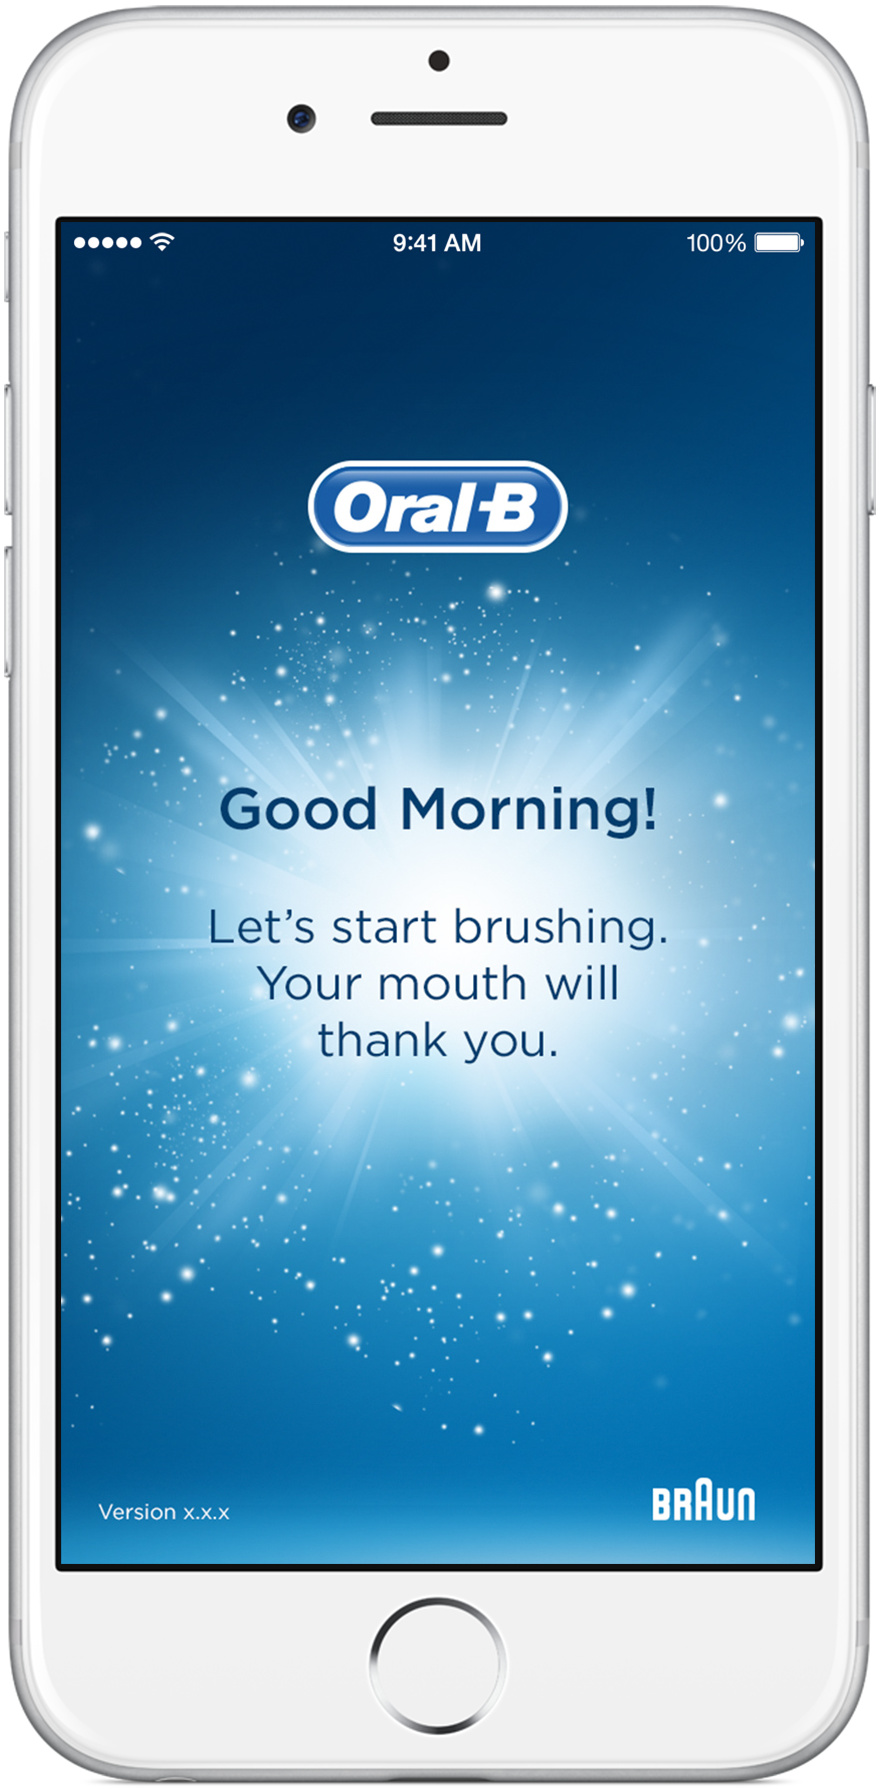 Oral-B app Start